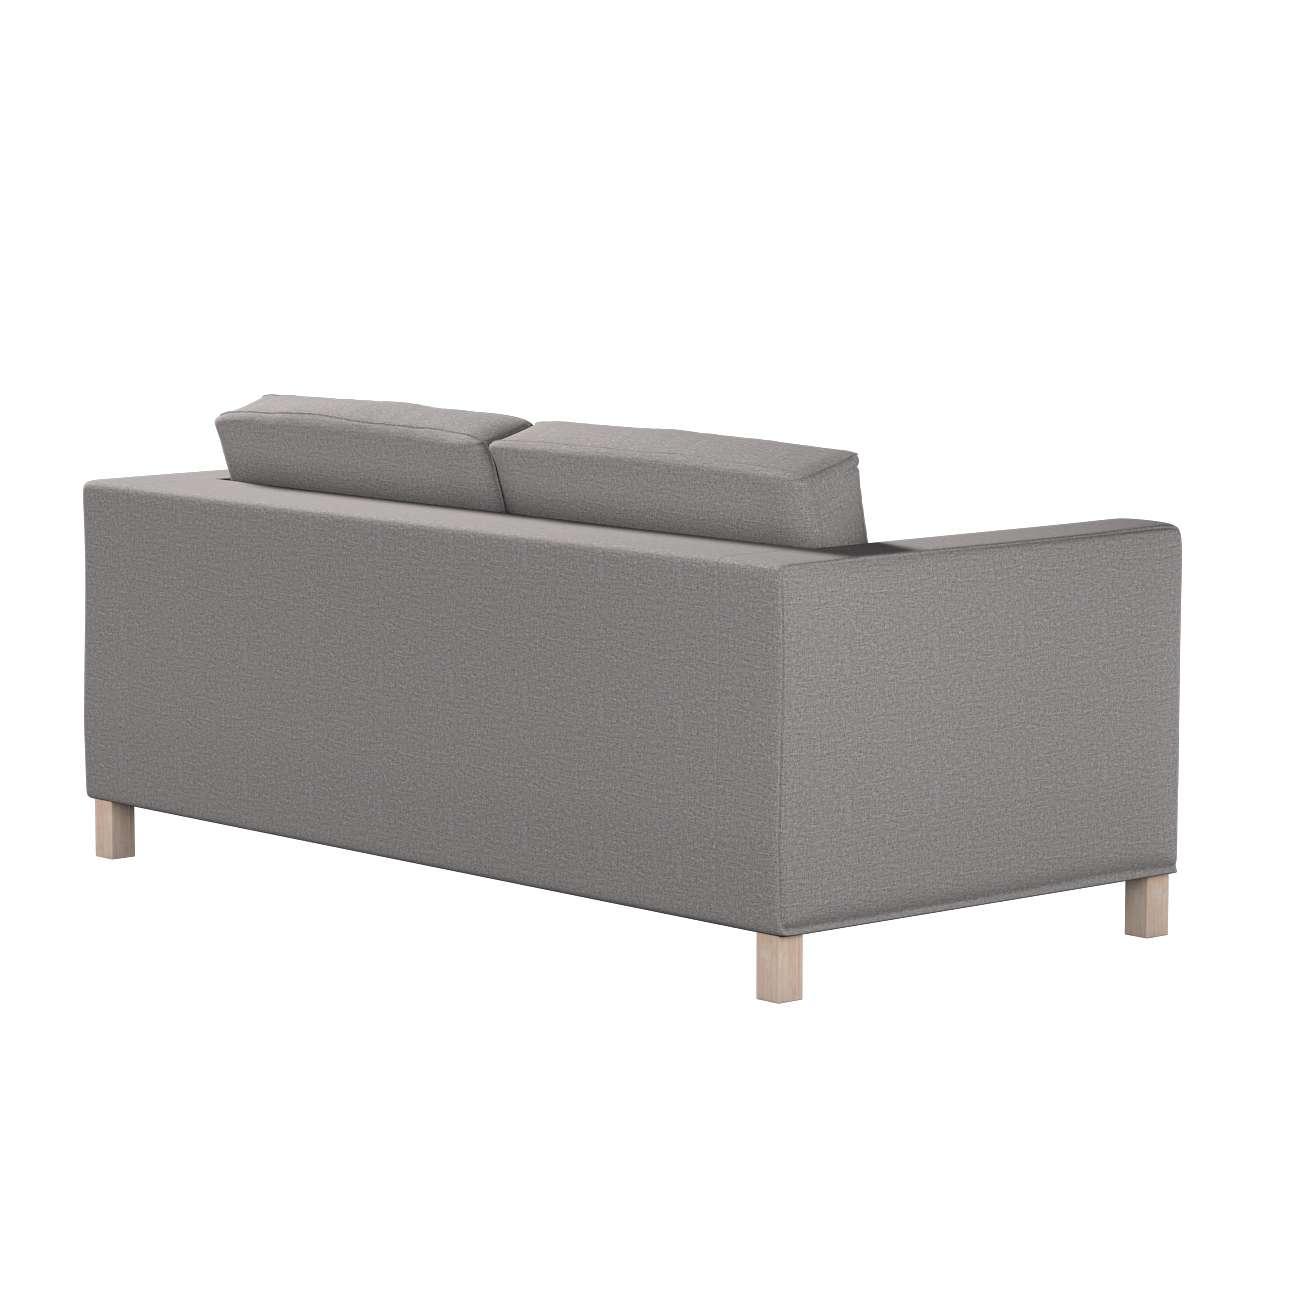 Potah na pohovku IKEA  Karlanda rozkládací, krátký v kolekci Edinburgh, látka: 115-81